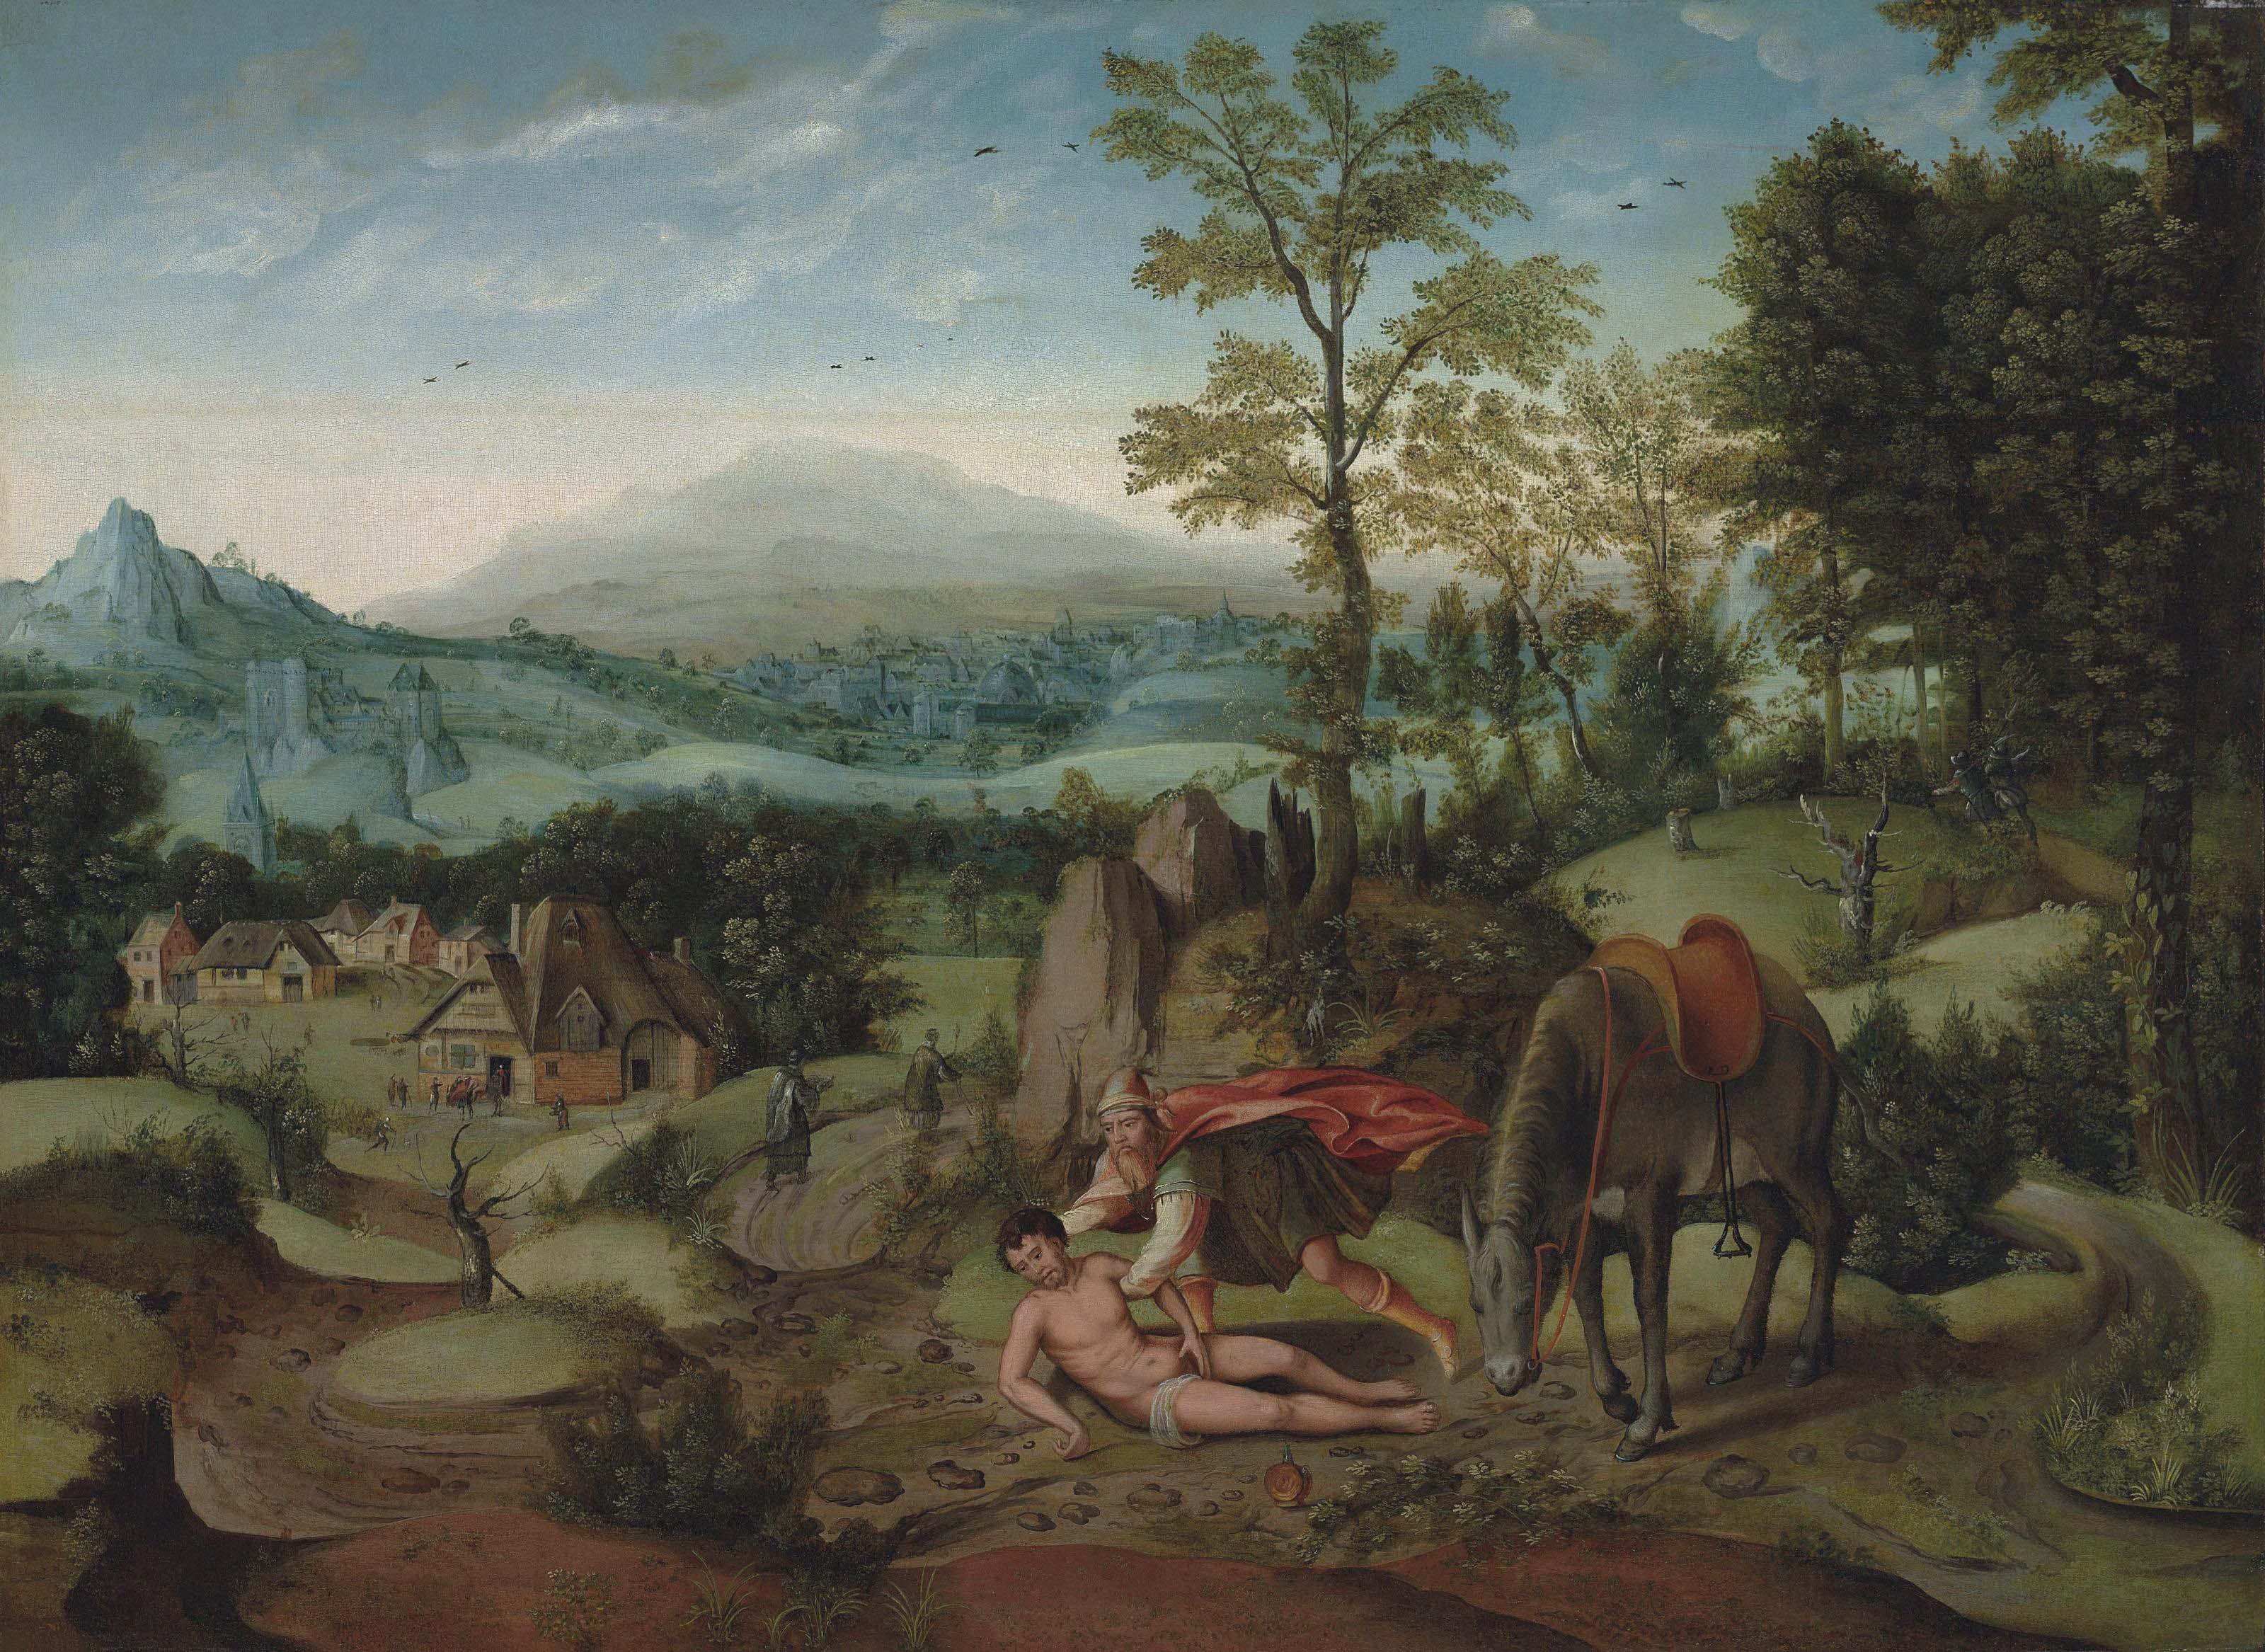 An extensive mountainous landscape with the Good Samaritan